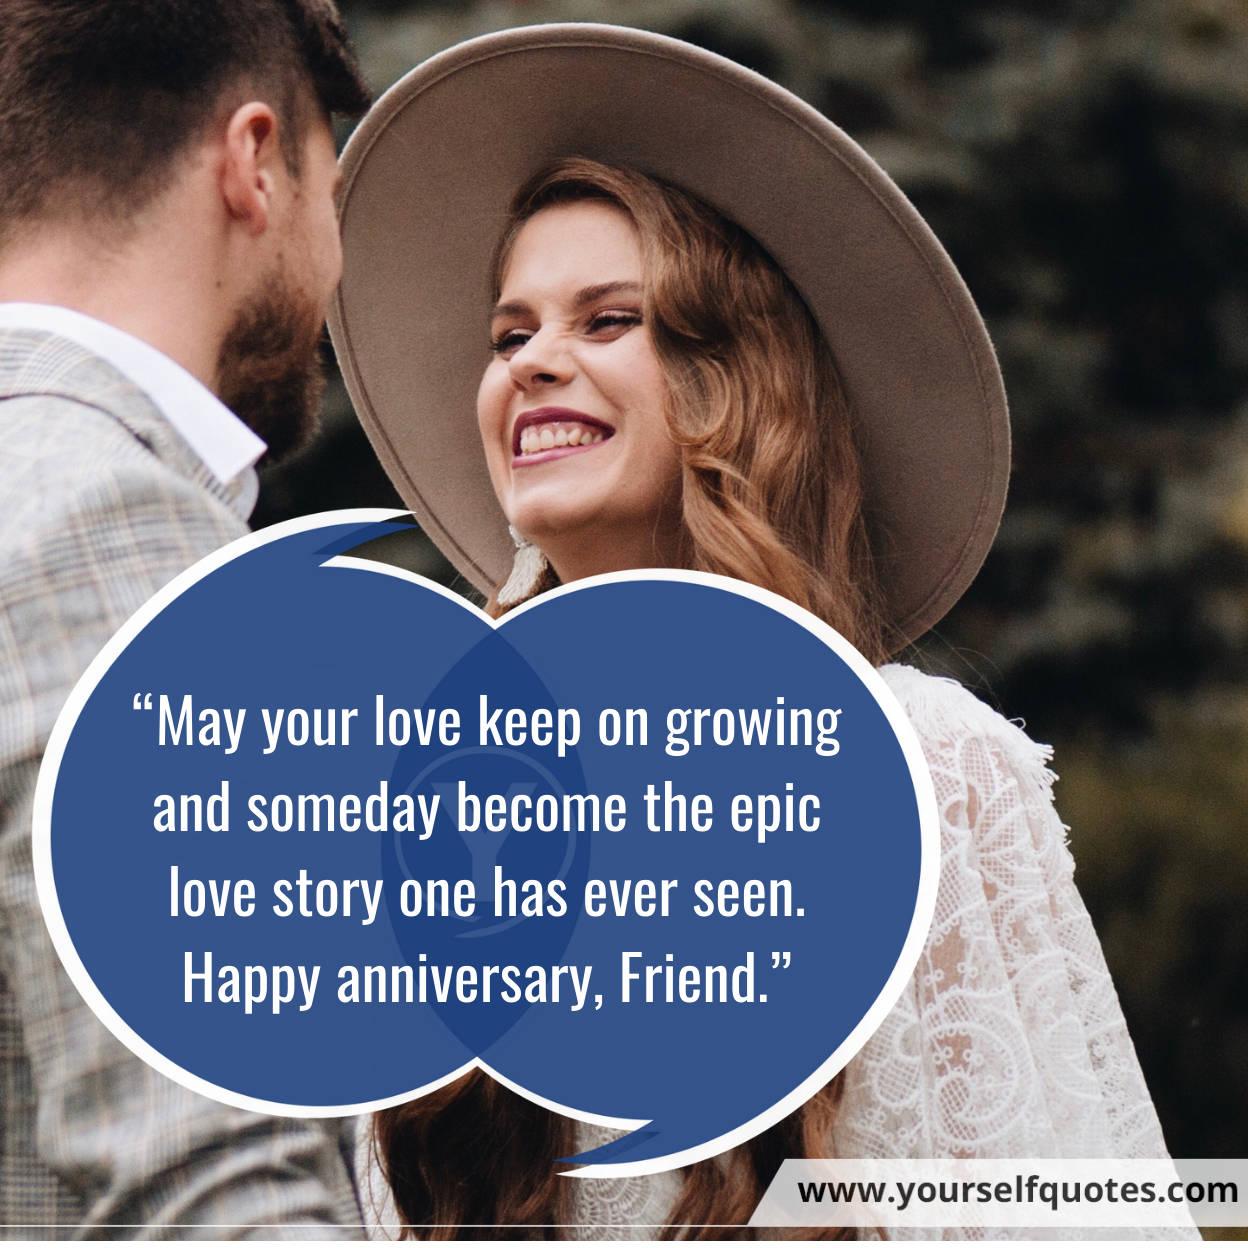 Selamat Ulang Tahun Pernikahan Temanku